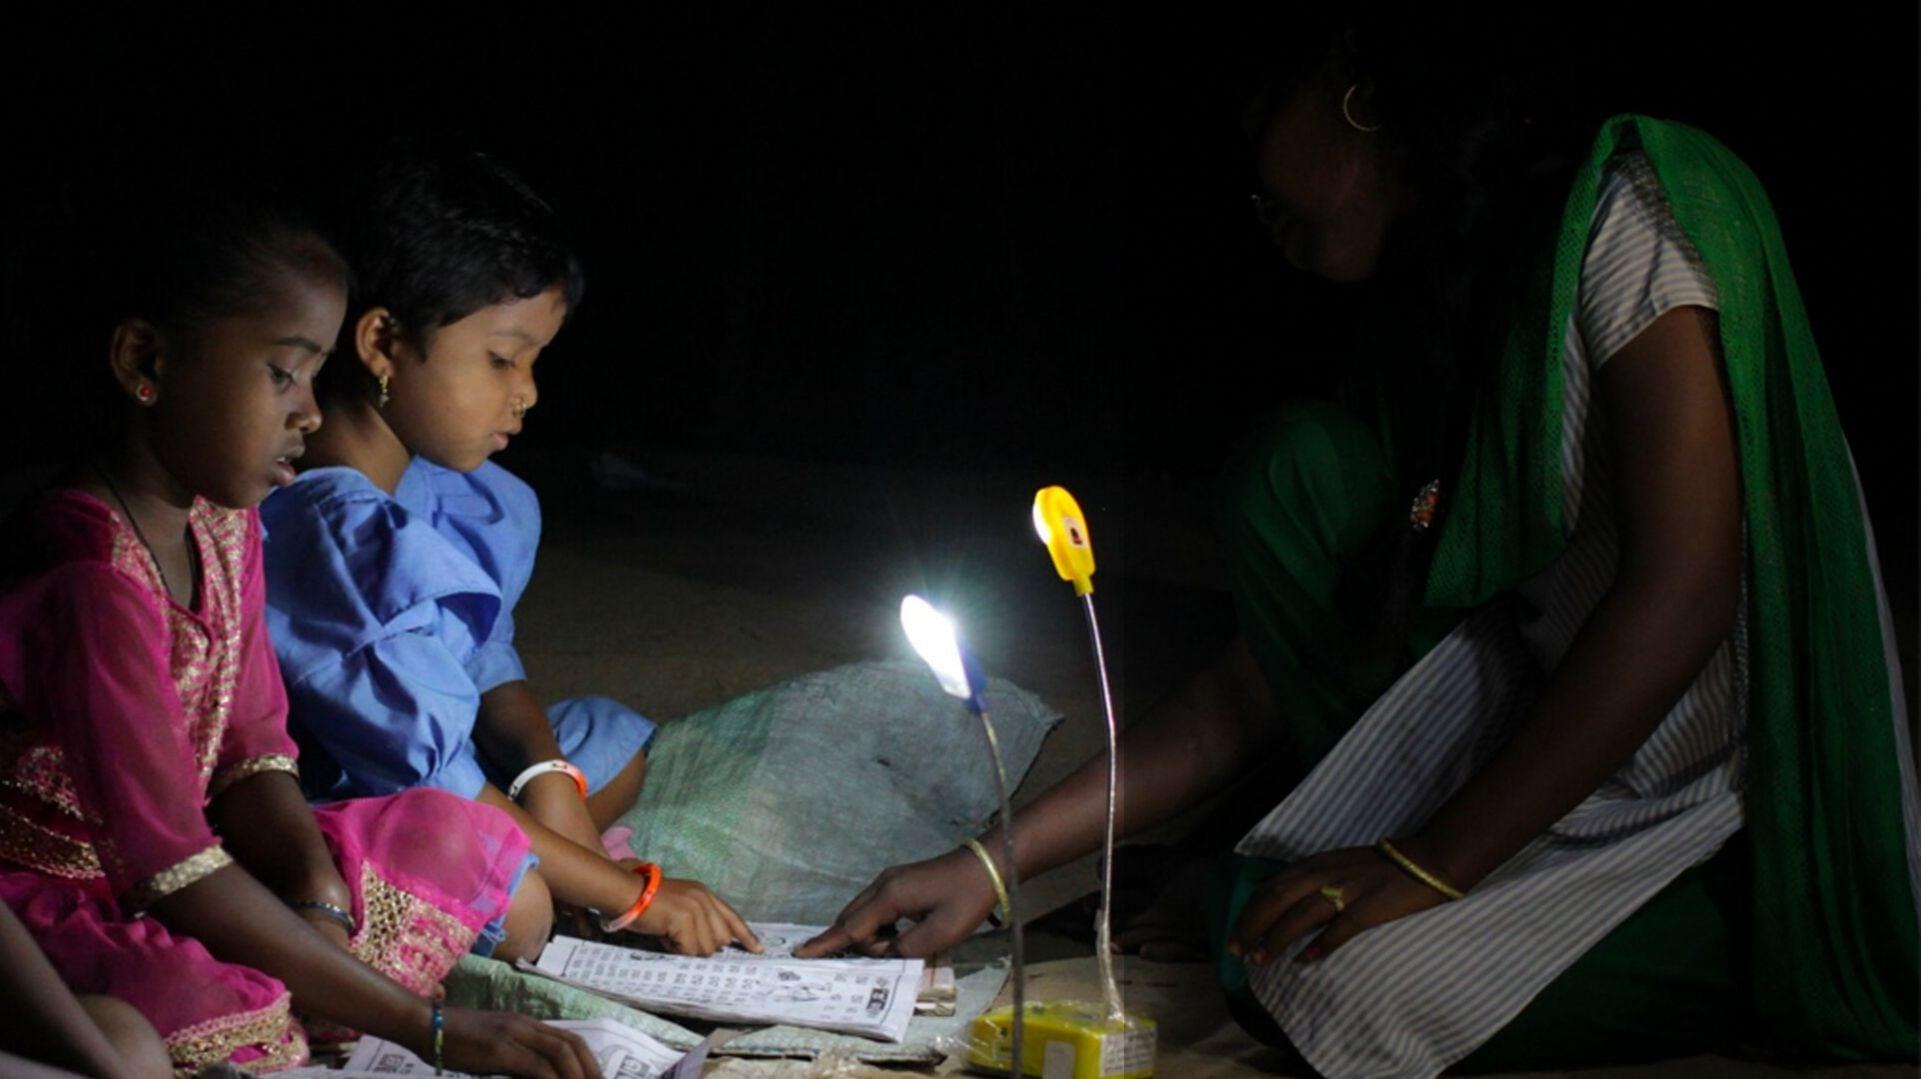 On Mahatma Gandhi's 150th birth anniversary, keeping his light shining through solar lamps and clean energy